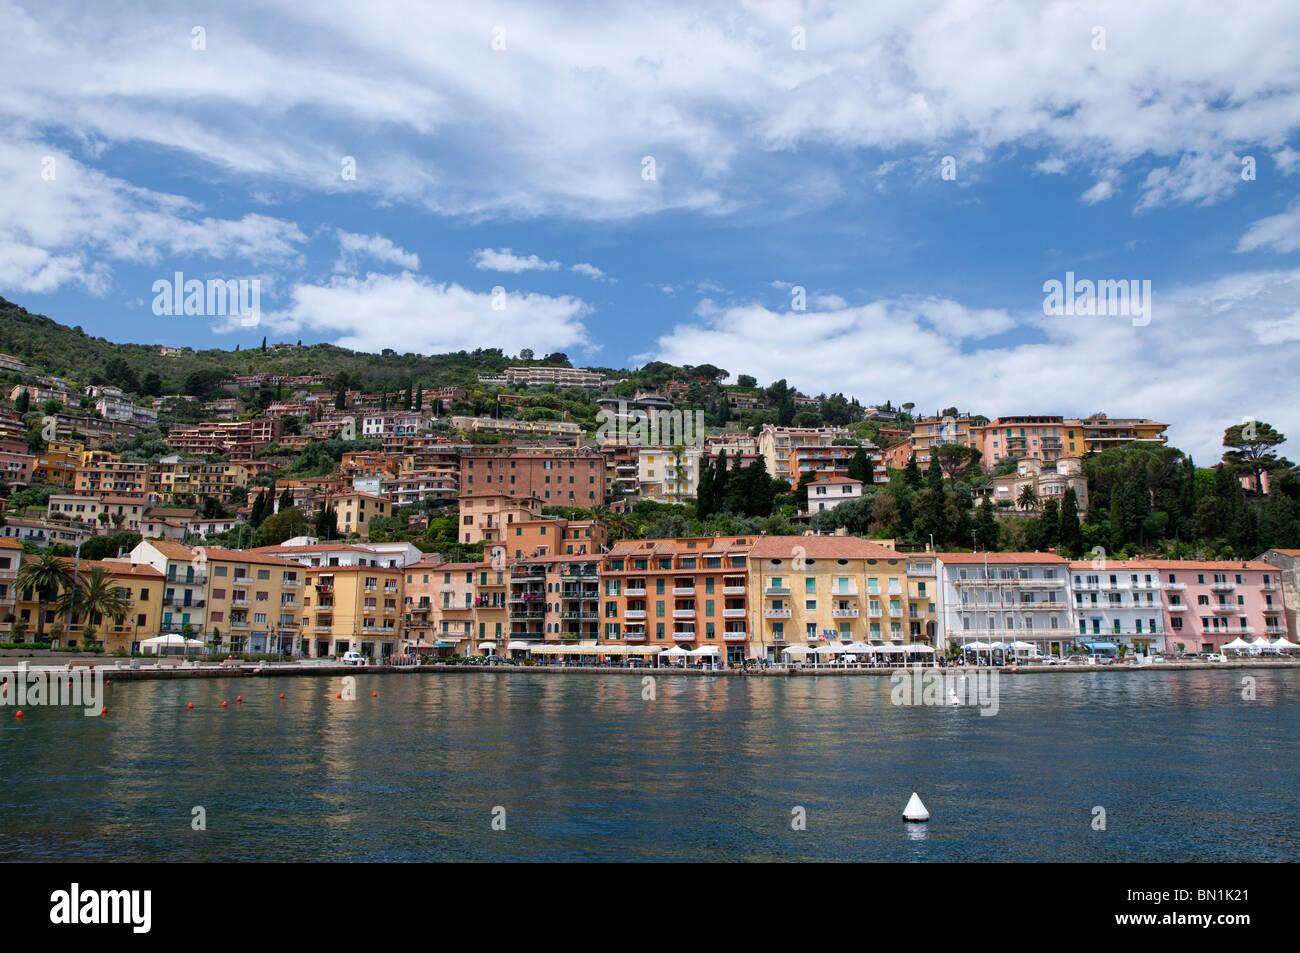 Porto Sante Stefano, Tuscany (Grosseto province), Italy - Stock Image